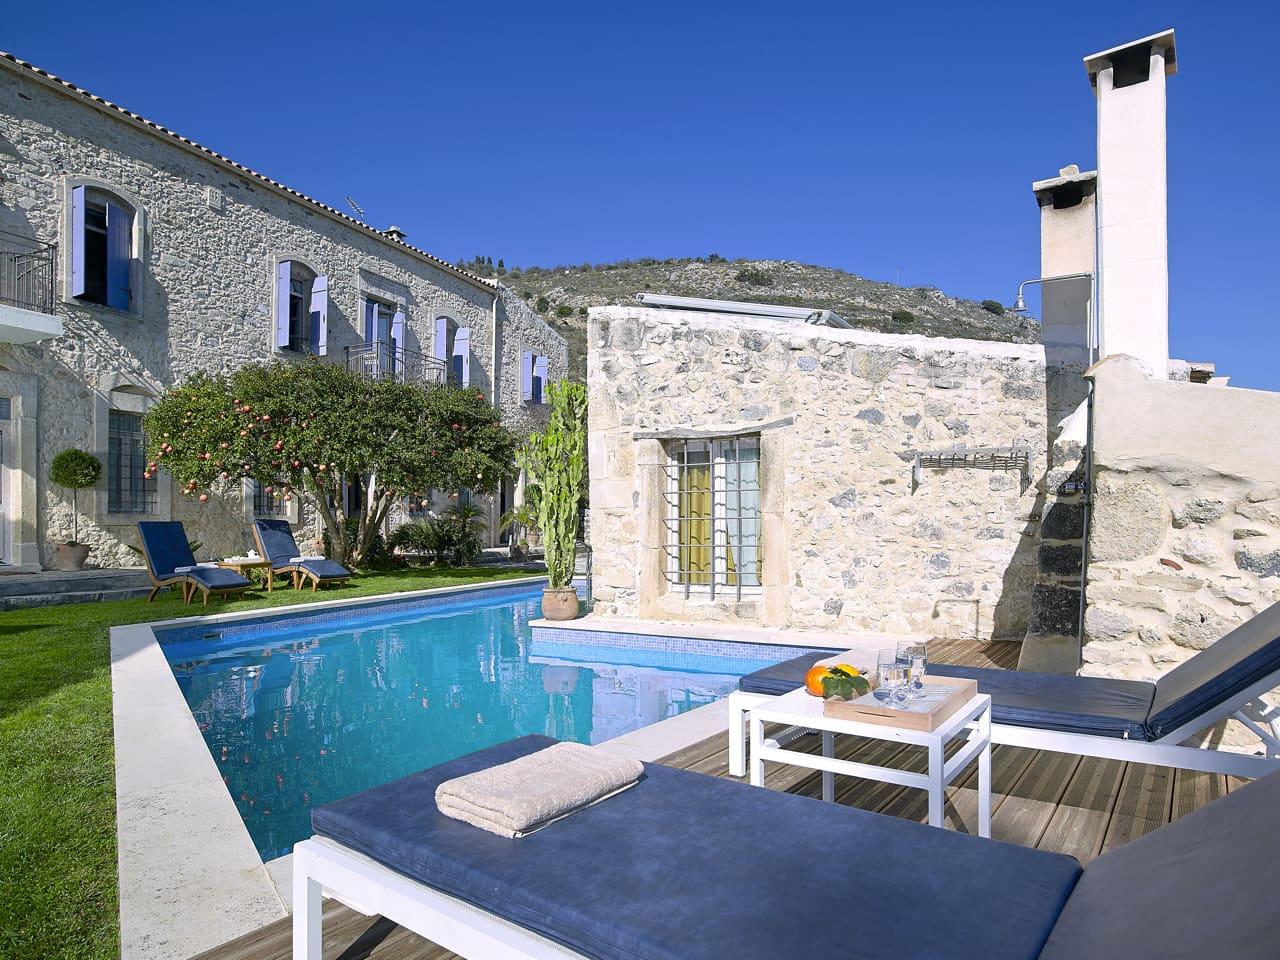 Villa Kerasia Inn - Your Home Away From Home